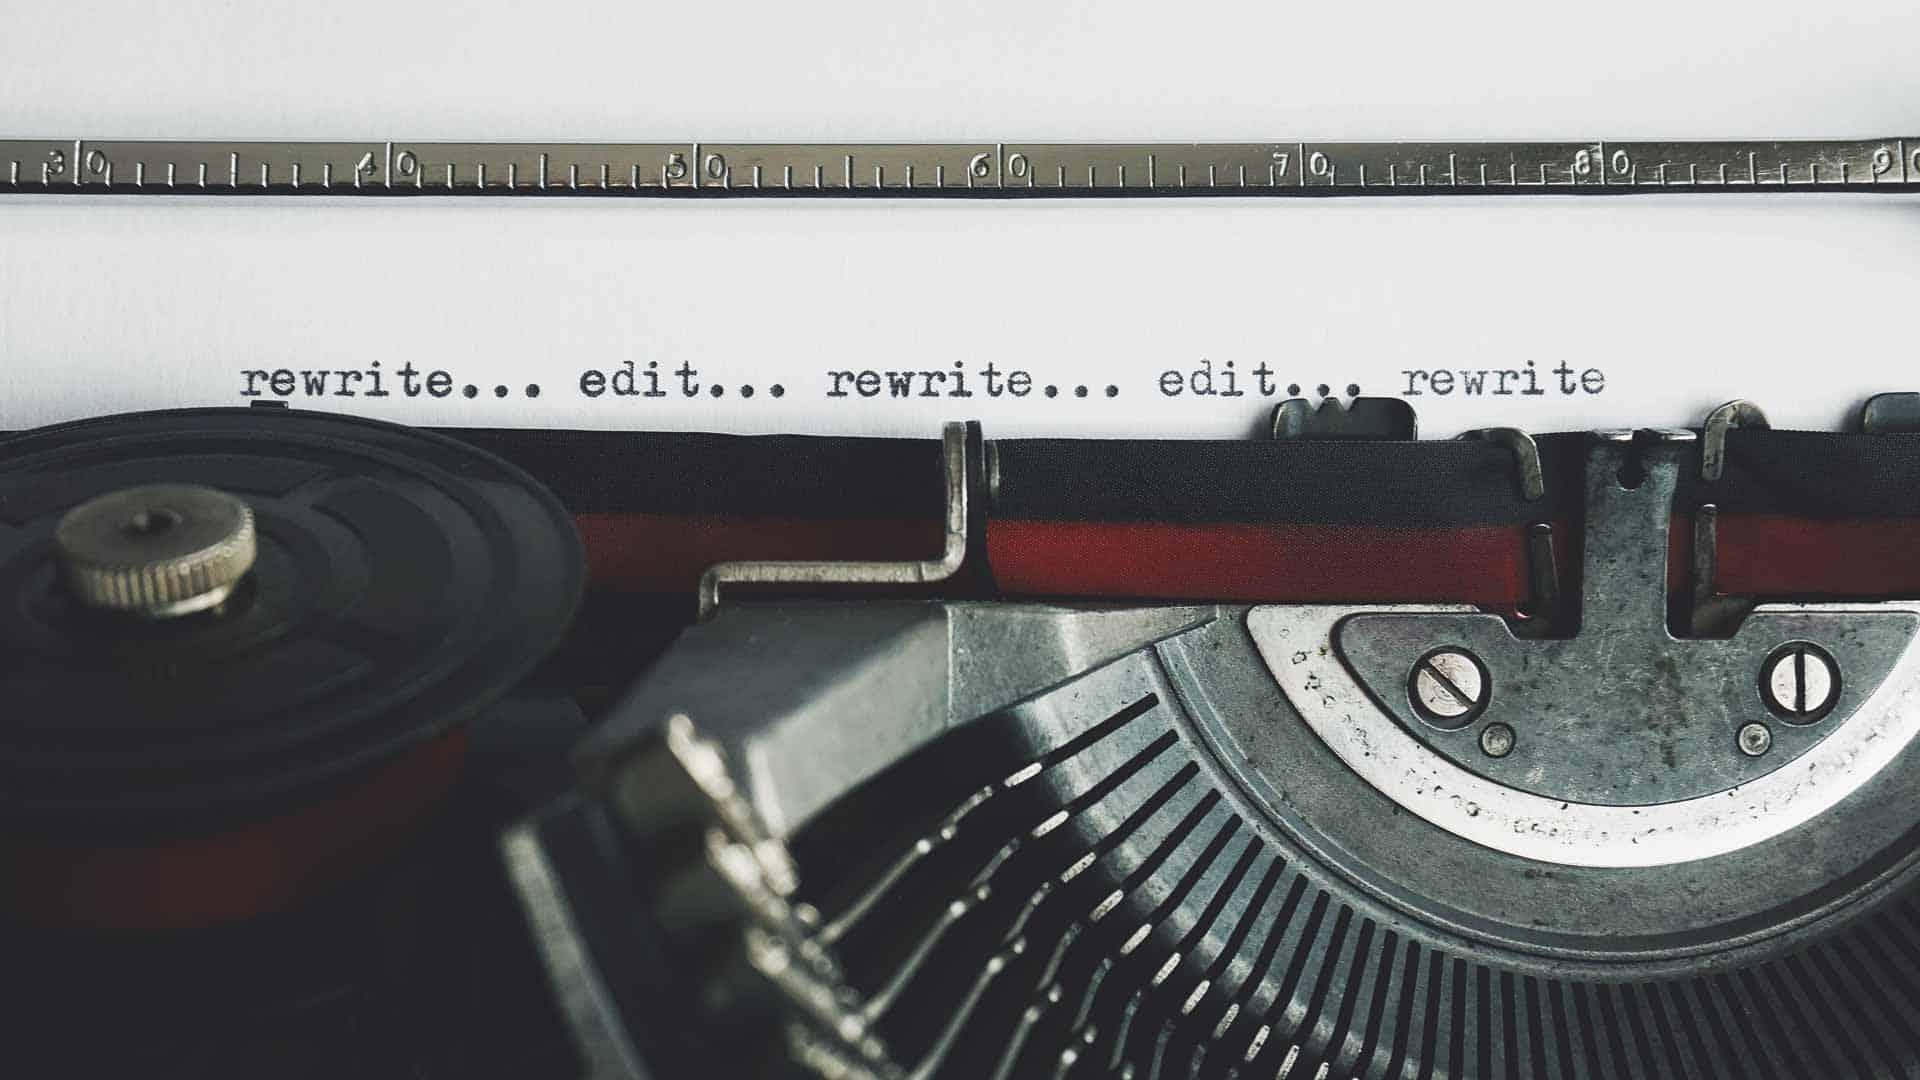 Scriptwriting on a typrwriter